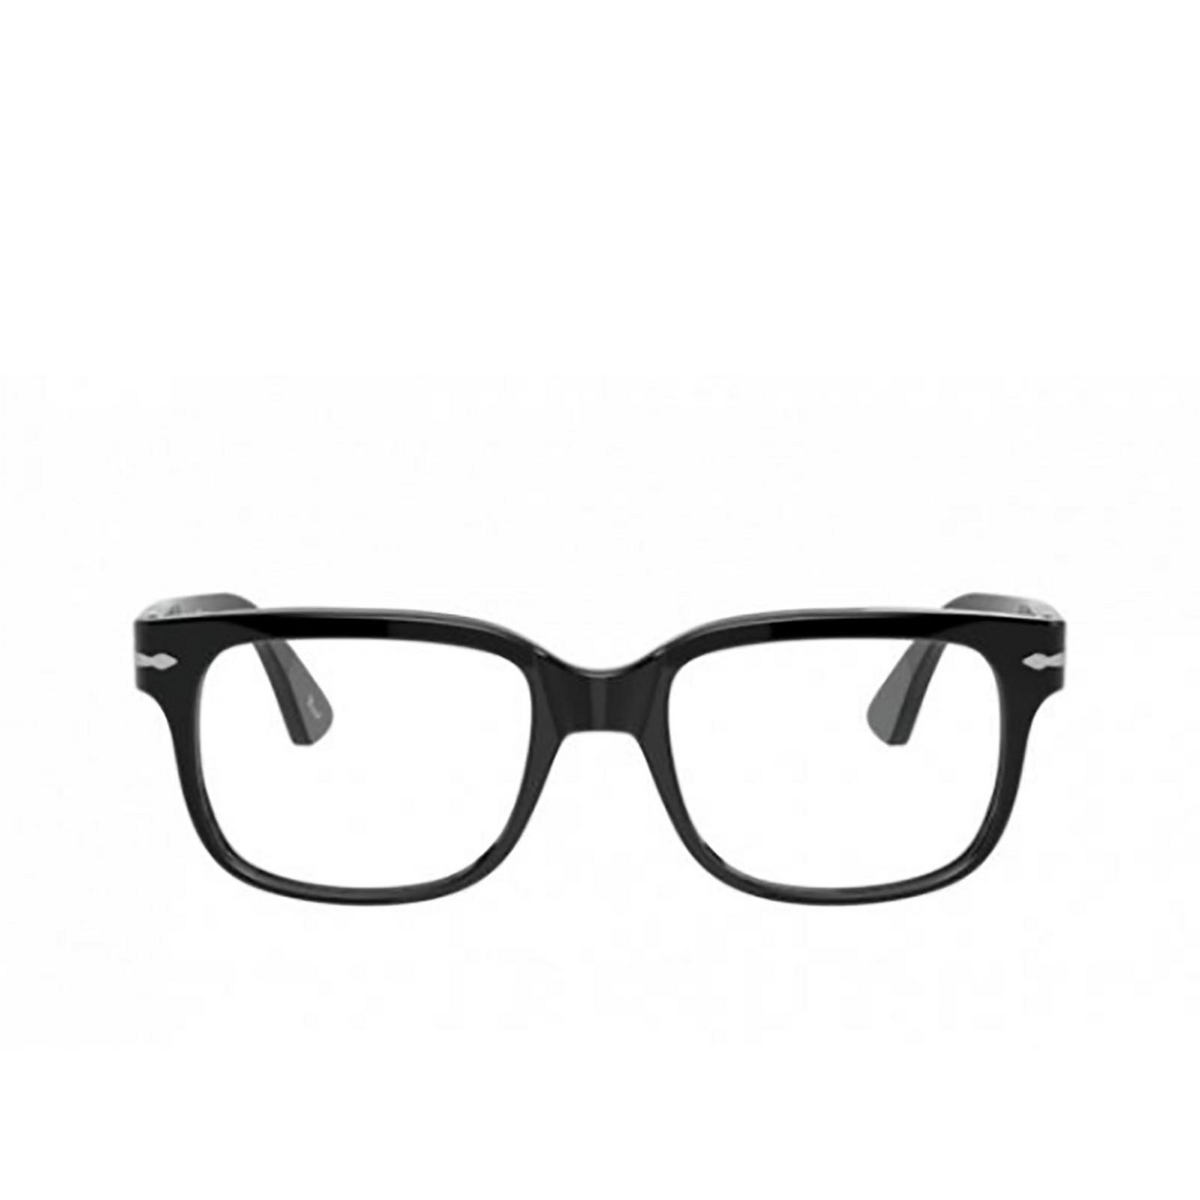 Persol® Square Eyeglasses: PO3252V color Black 95 - front view.